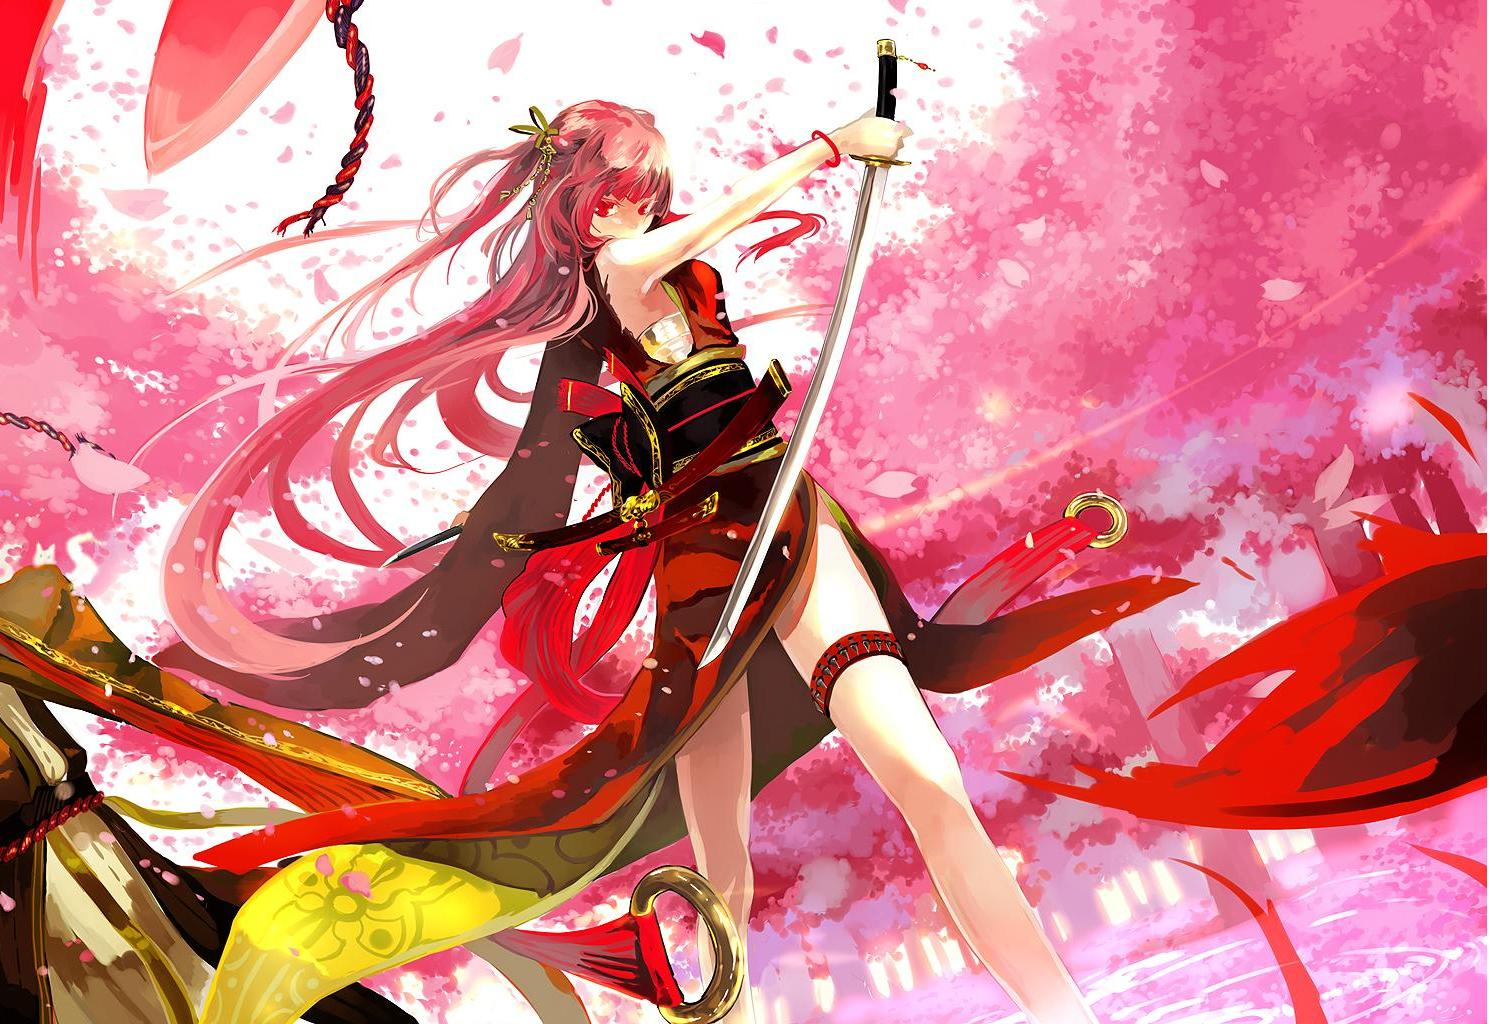 Sexy samurai anime girls wallpapers imagez only - Ninja anime wallpaper ...